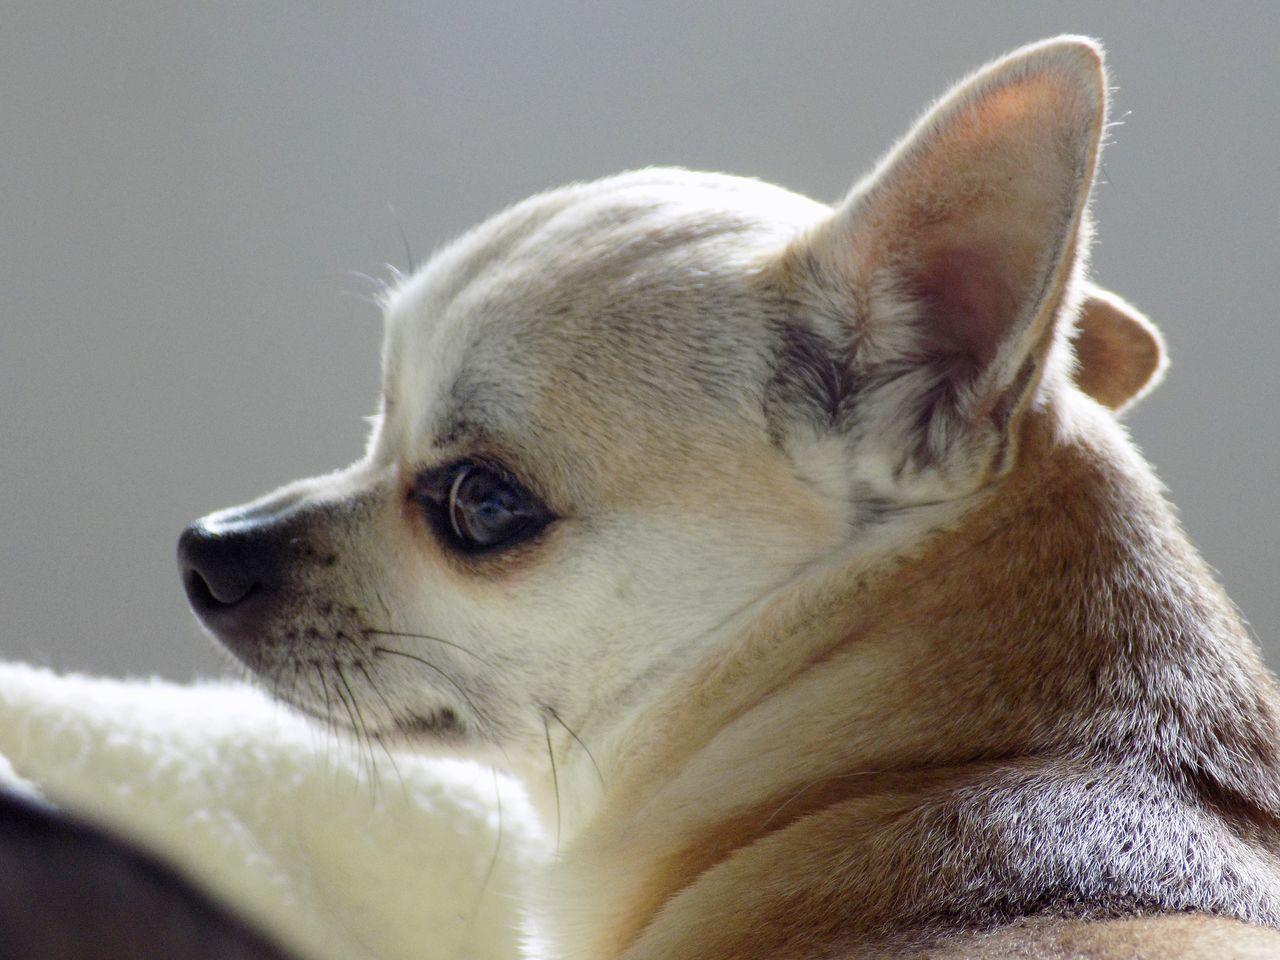 Beautiful stock photos of chihuahua, Animal Themes, Chihuahua - Dog, Close-Up, Dog